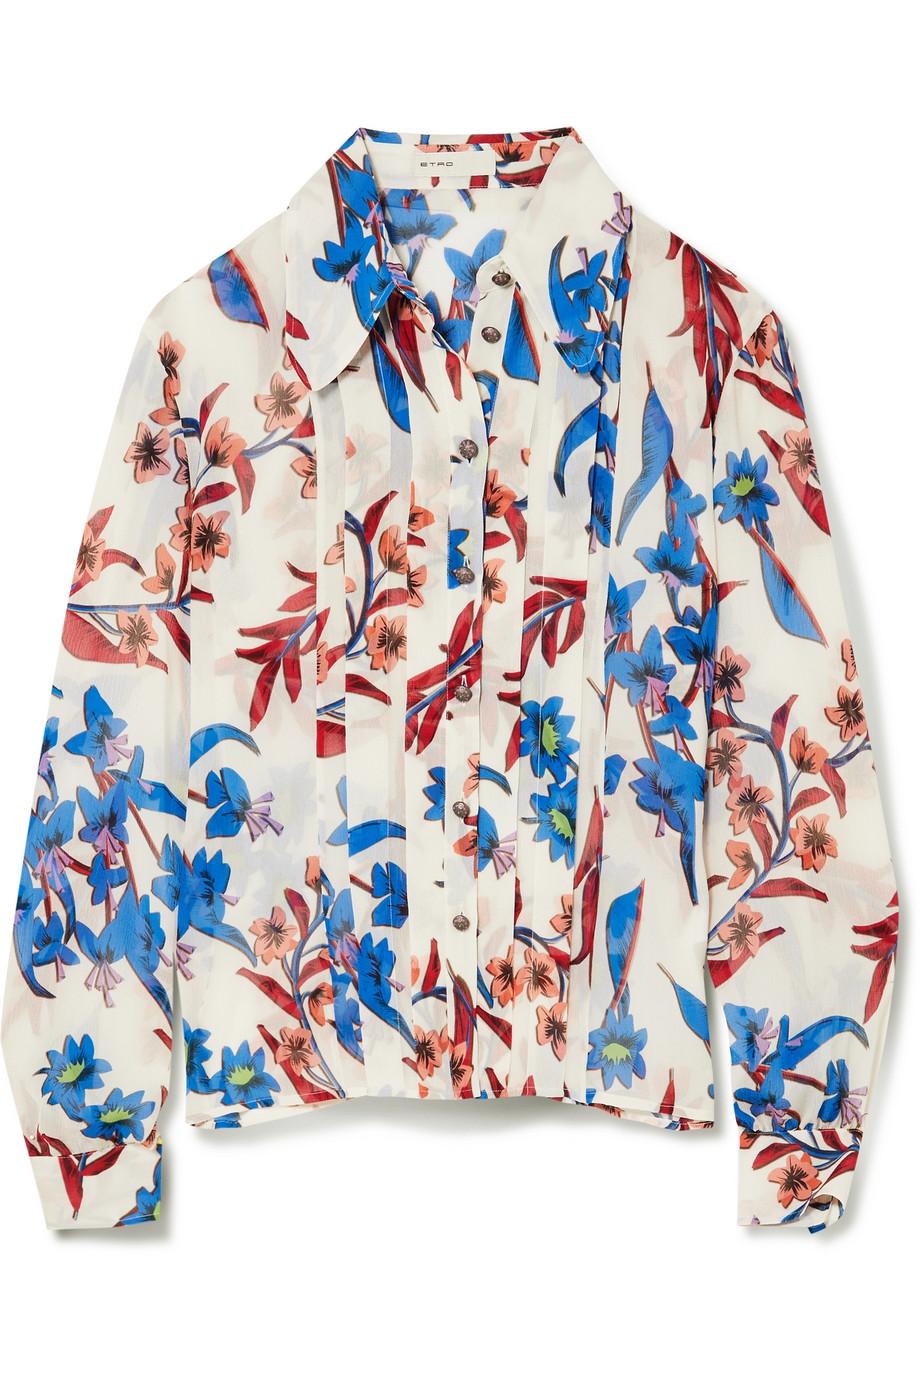 Etro | Printed crinkled-silk blouse | NET-A-PORTER.COM